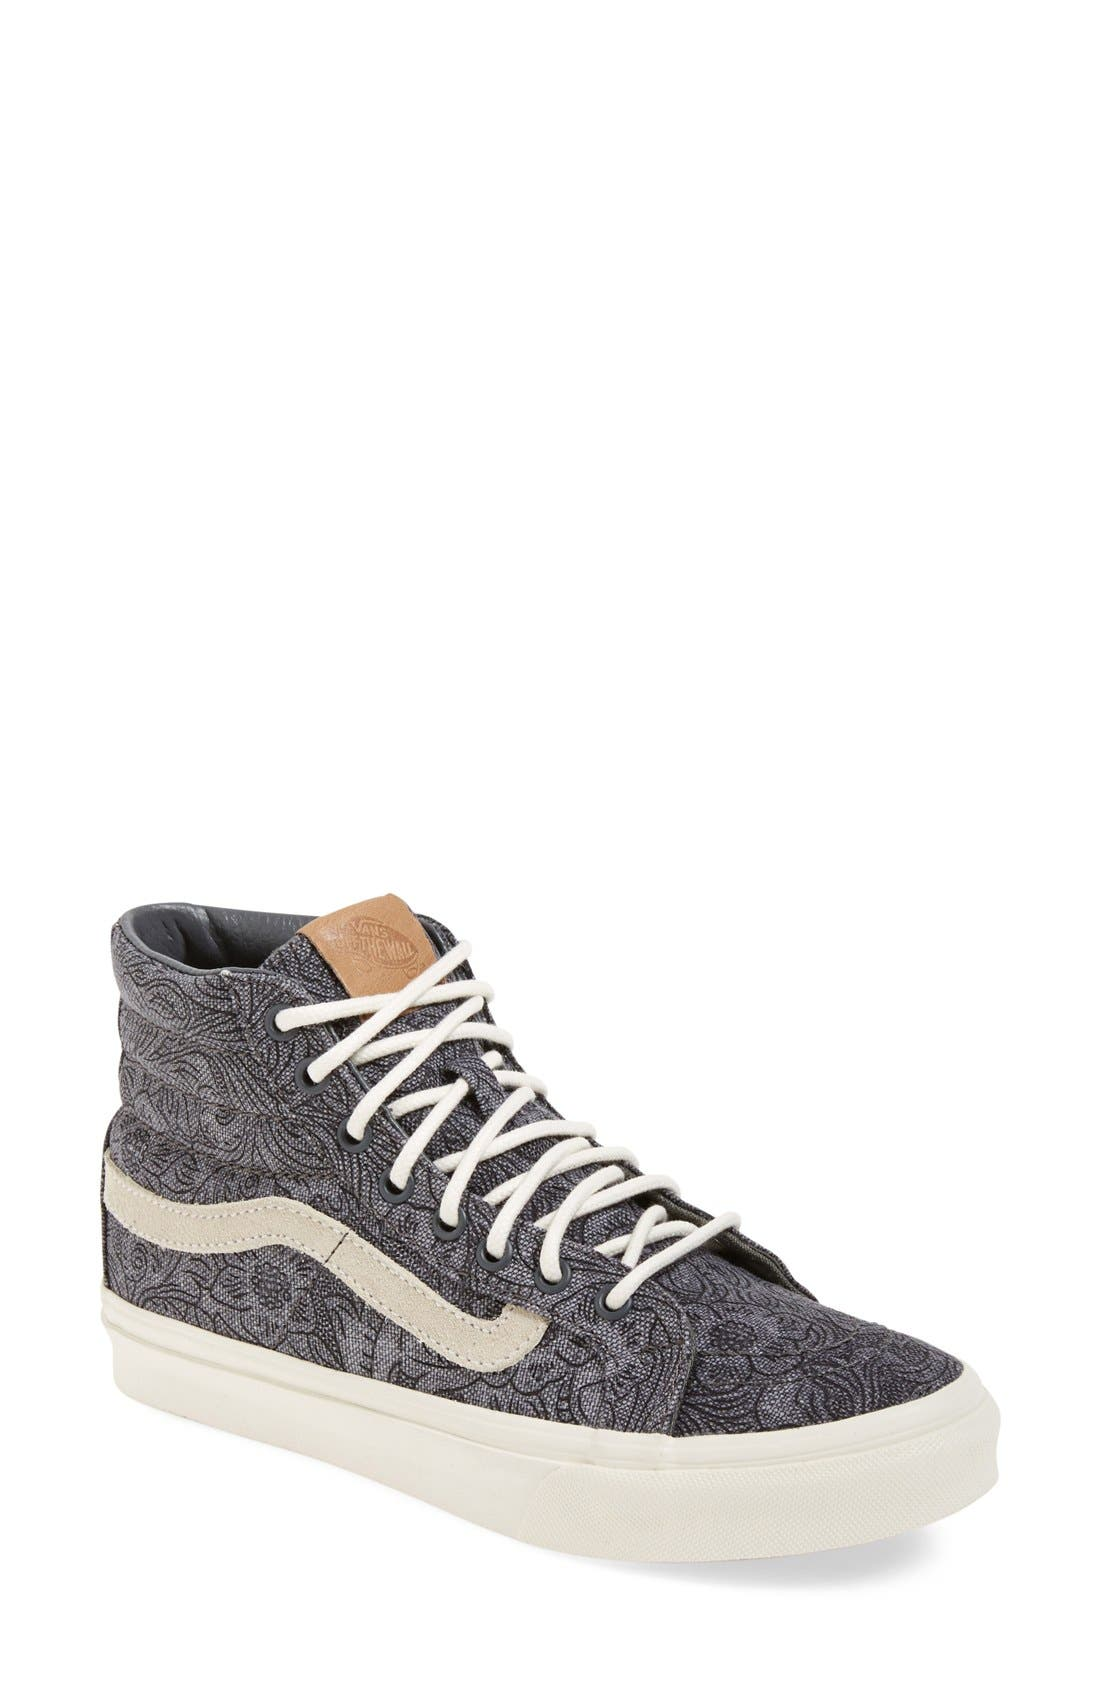 Alternate Image 1 Selected - Vans 'Sk8-Hi Slim' Sneaker (Women)